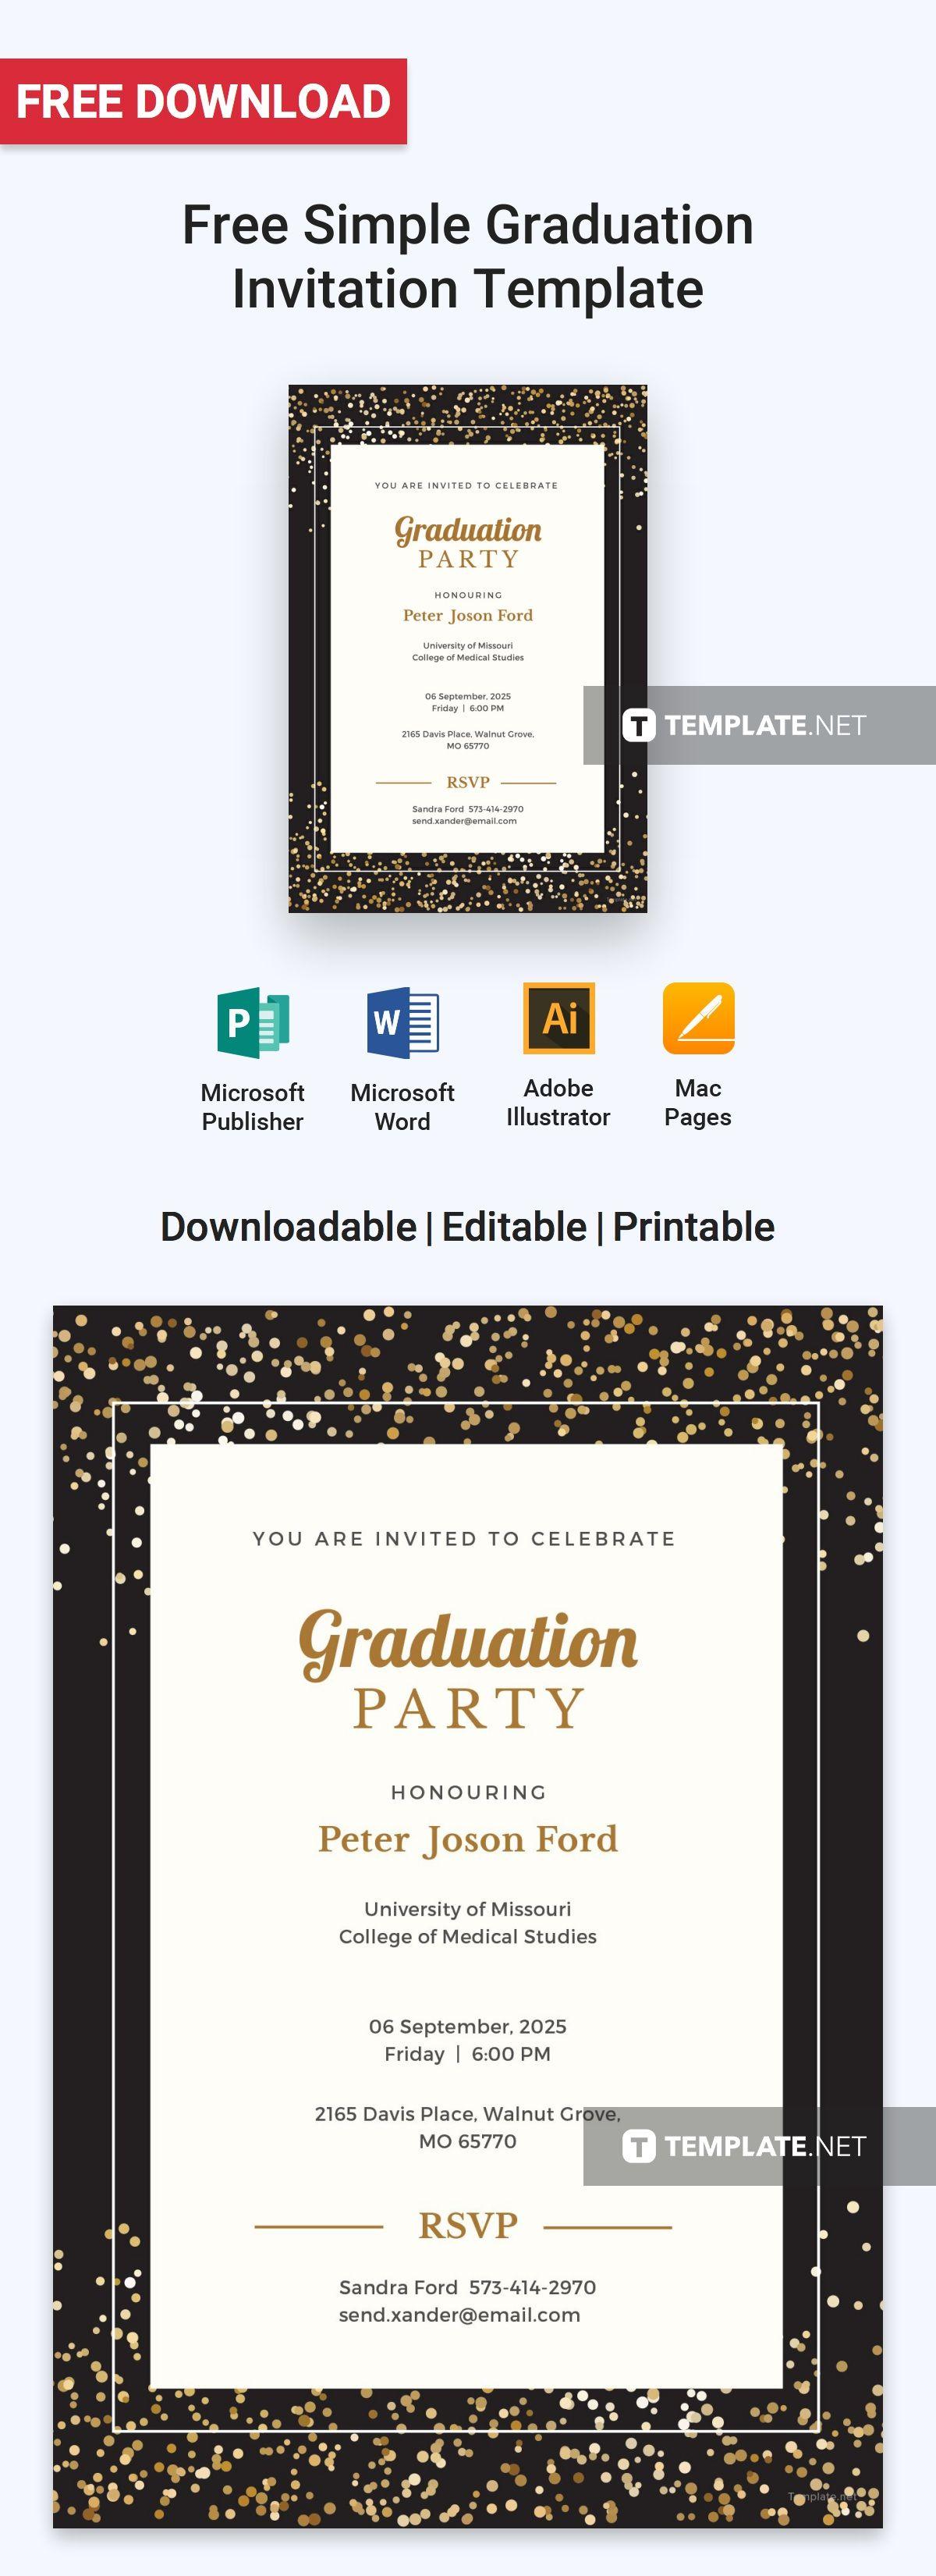 free simple graduation invitation invitation templates designs